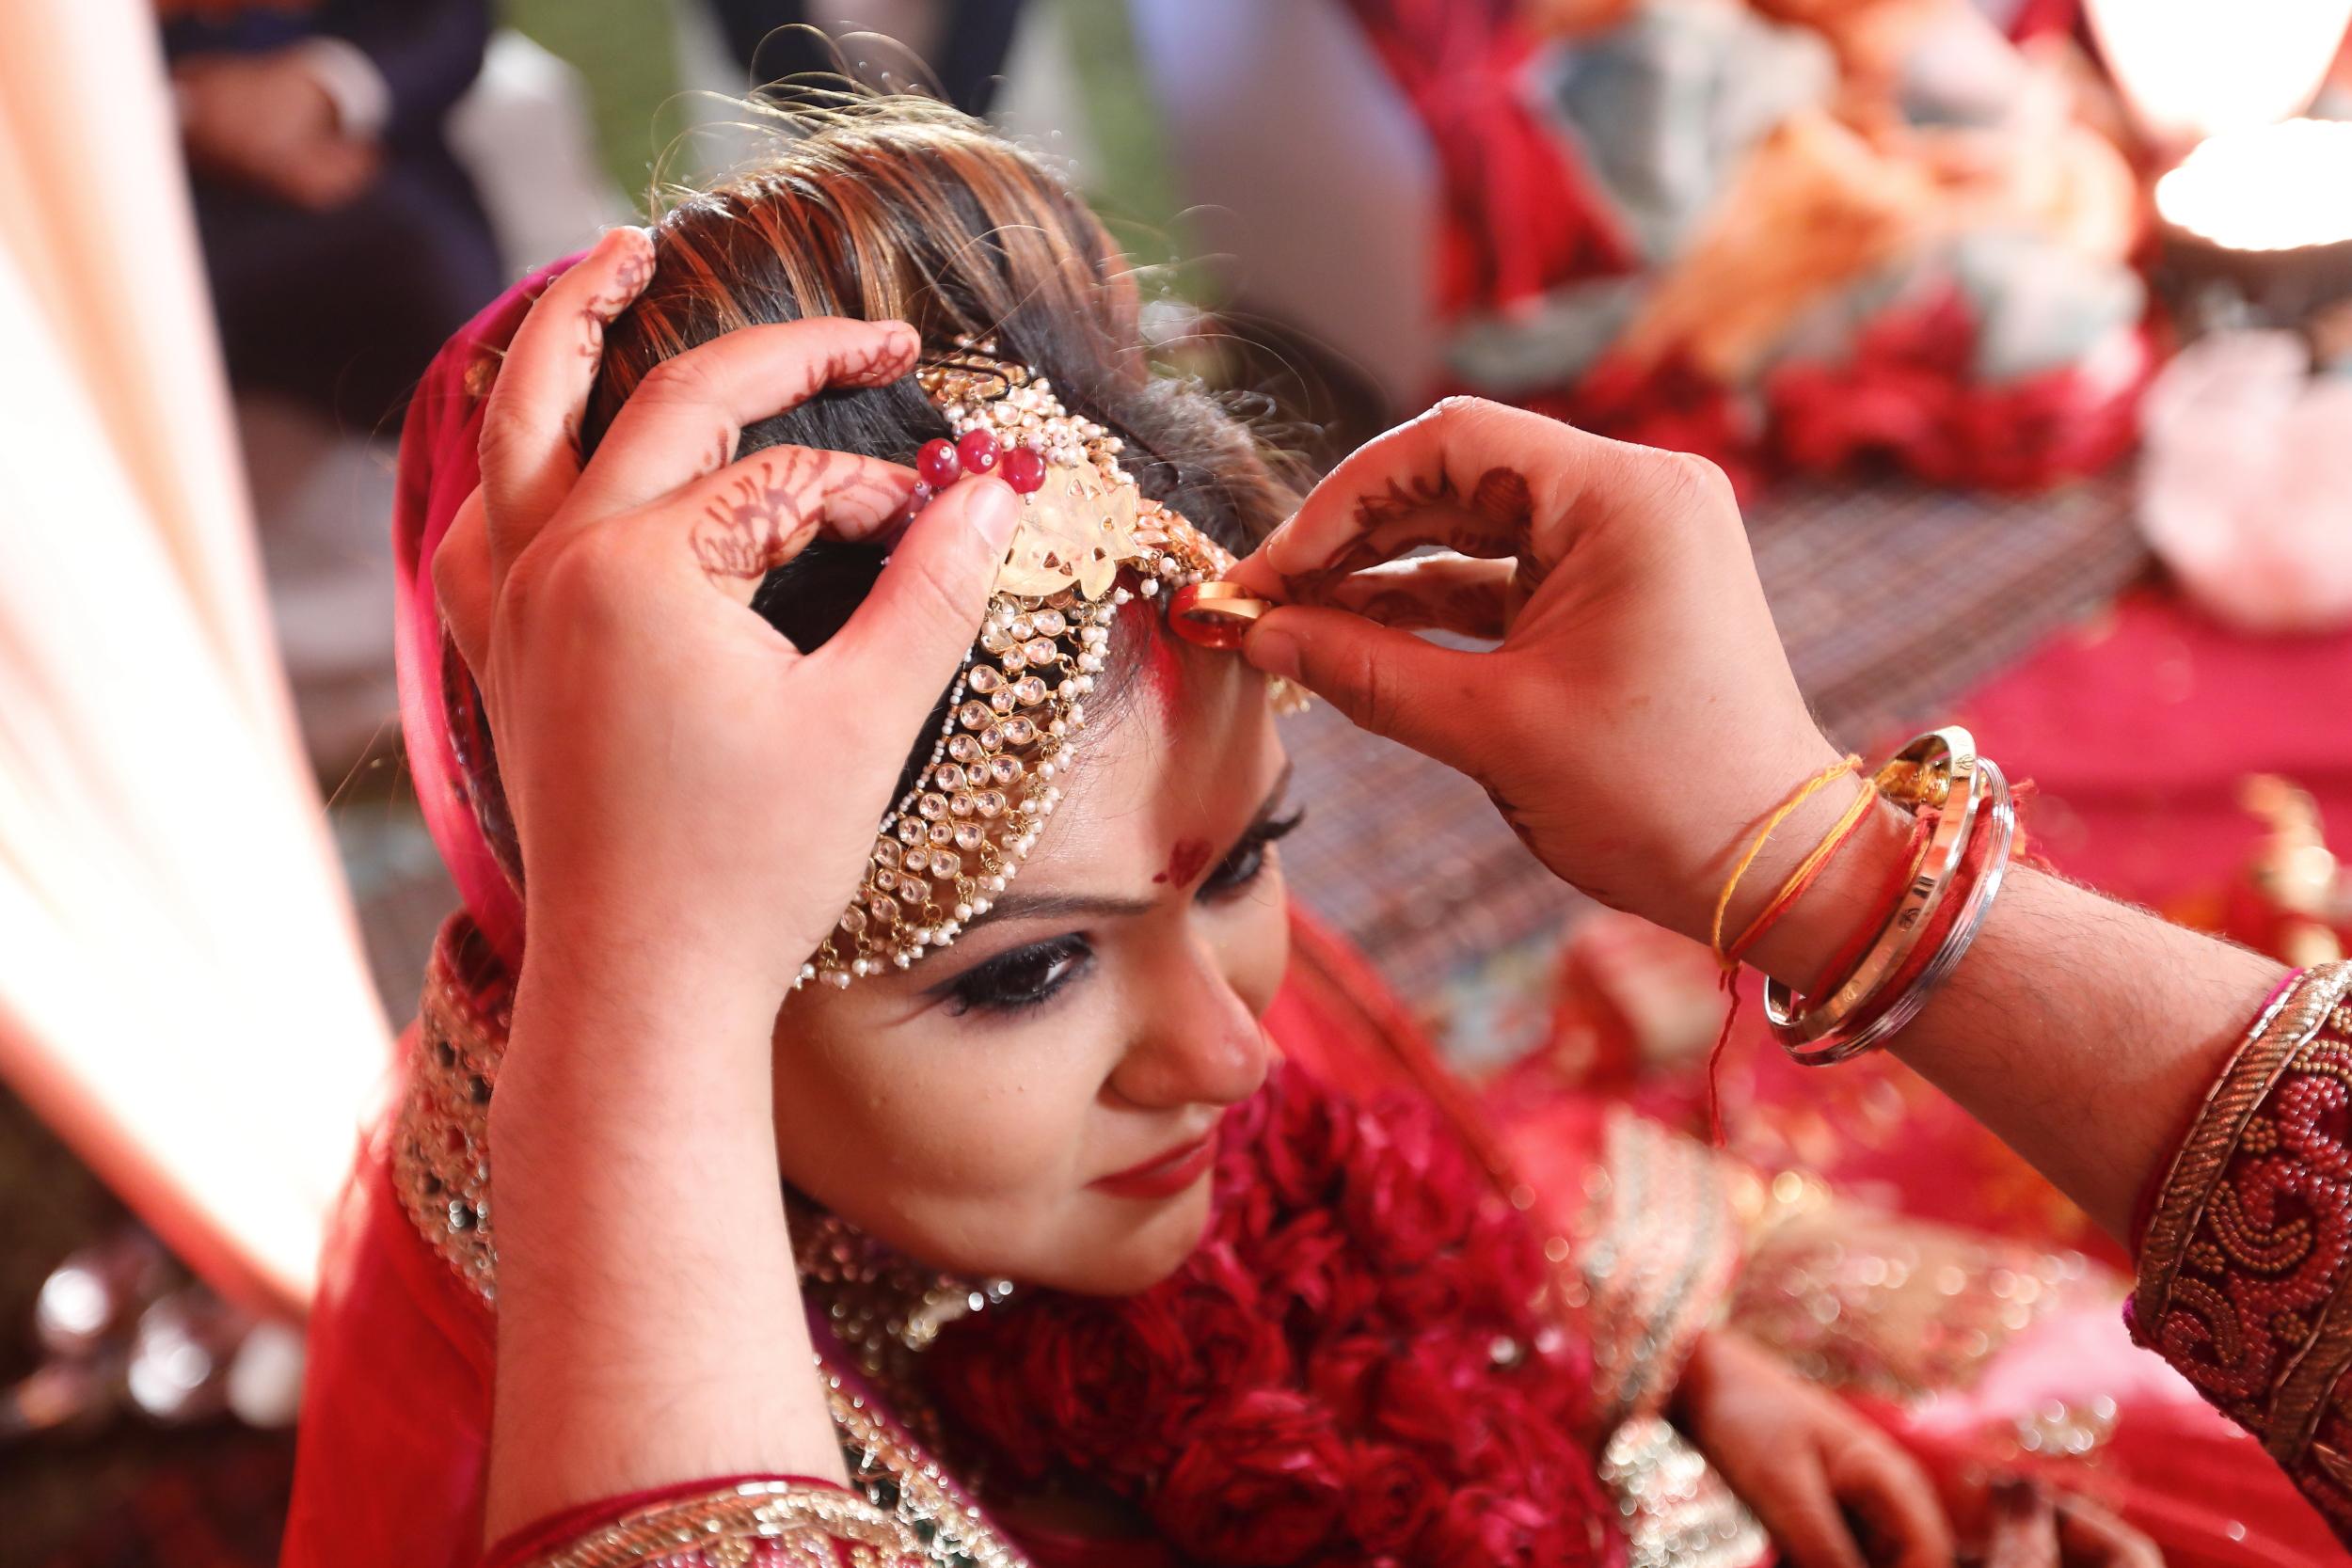 Candid wedding photographersC69A1283 Delhi